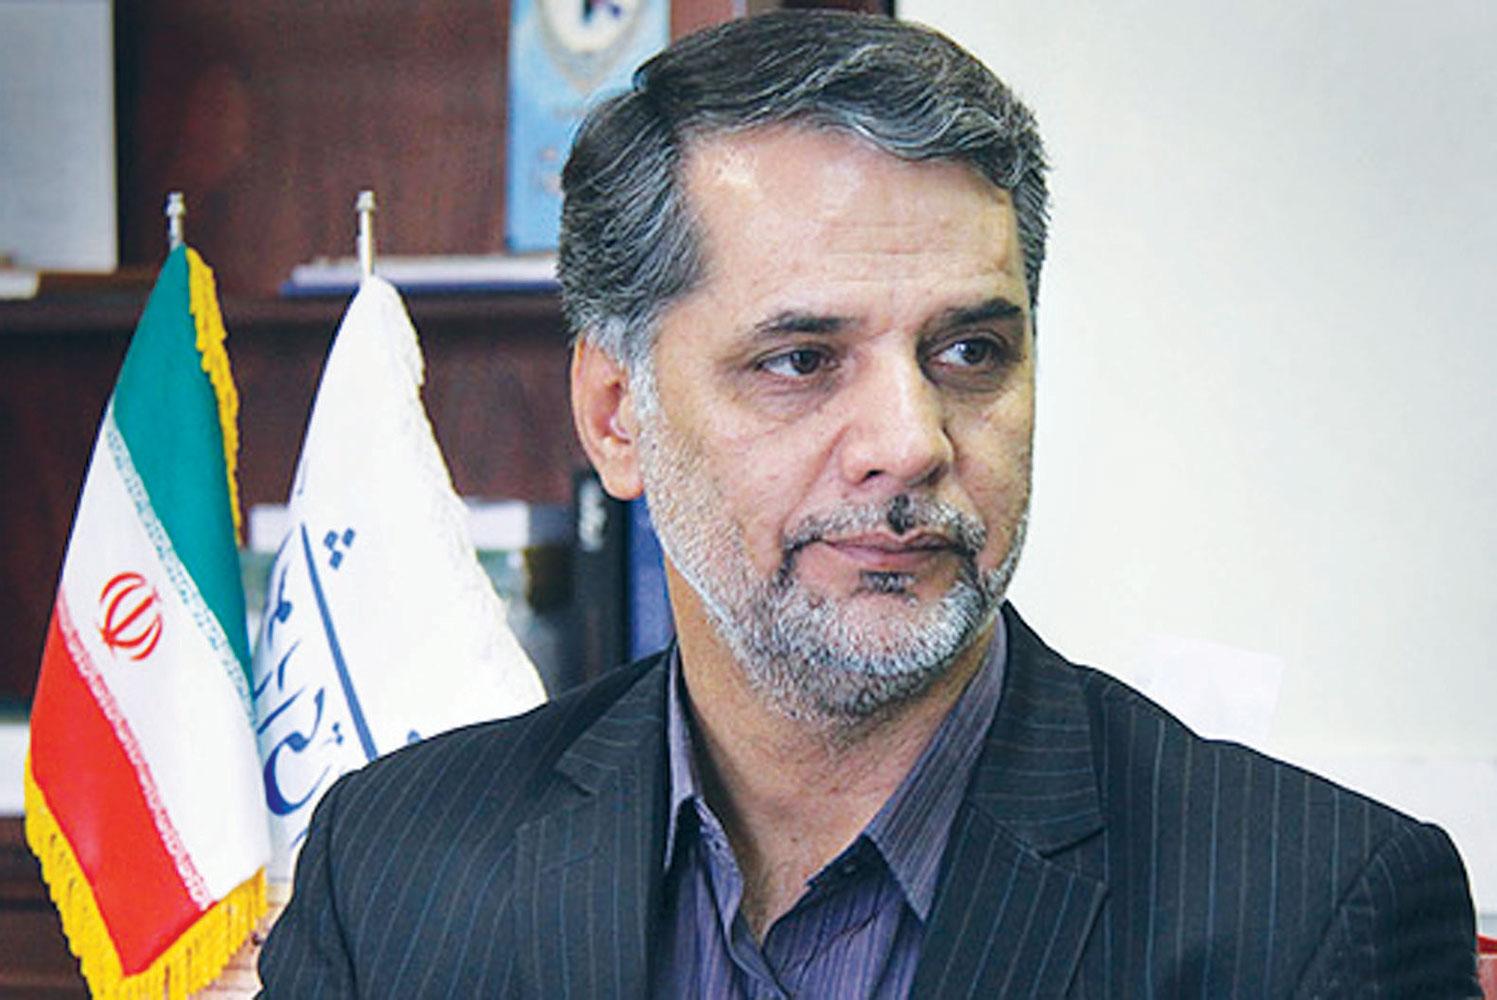 Iran has options on Trump's hostile approach, warns lawmaker